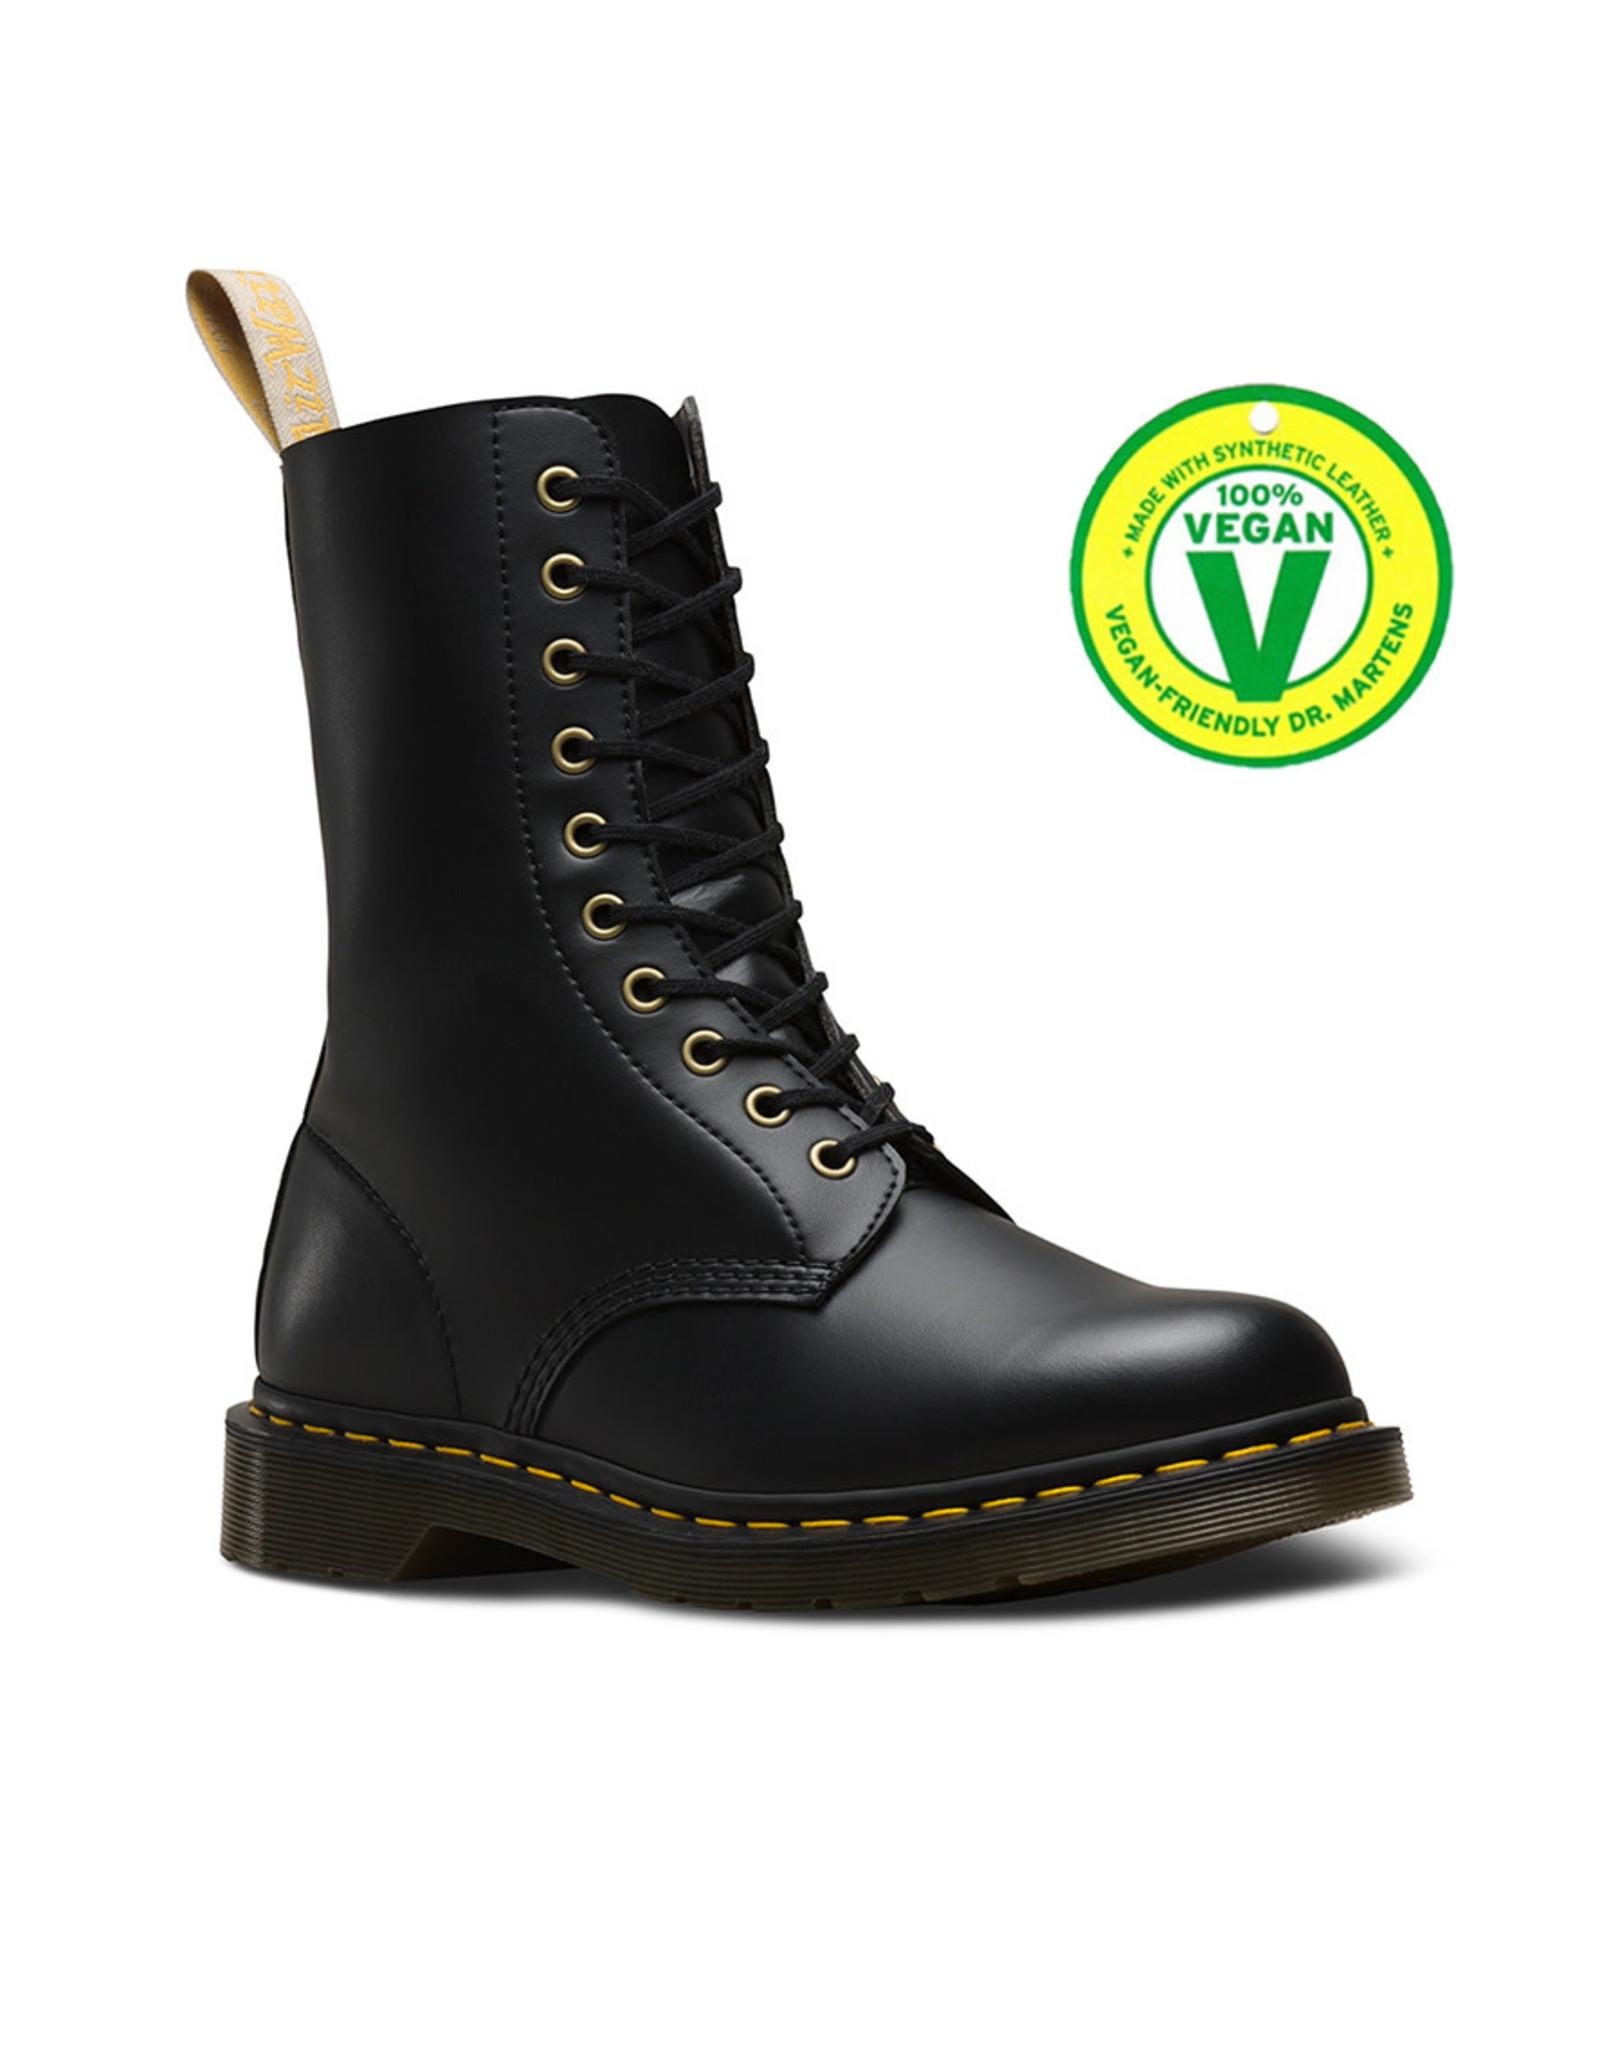 DR. MARTENS 1490 VEGAN BLACK FELIX RUB OFF 1000VEB-R23981001